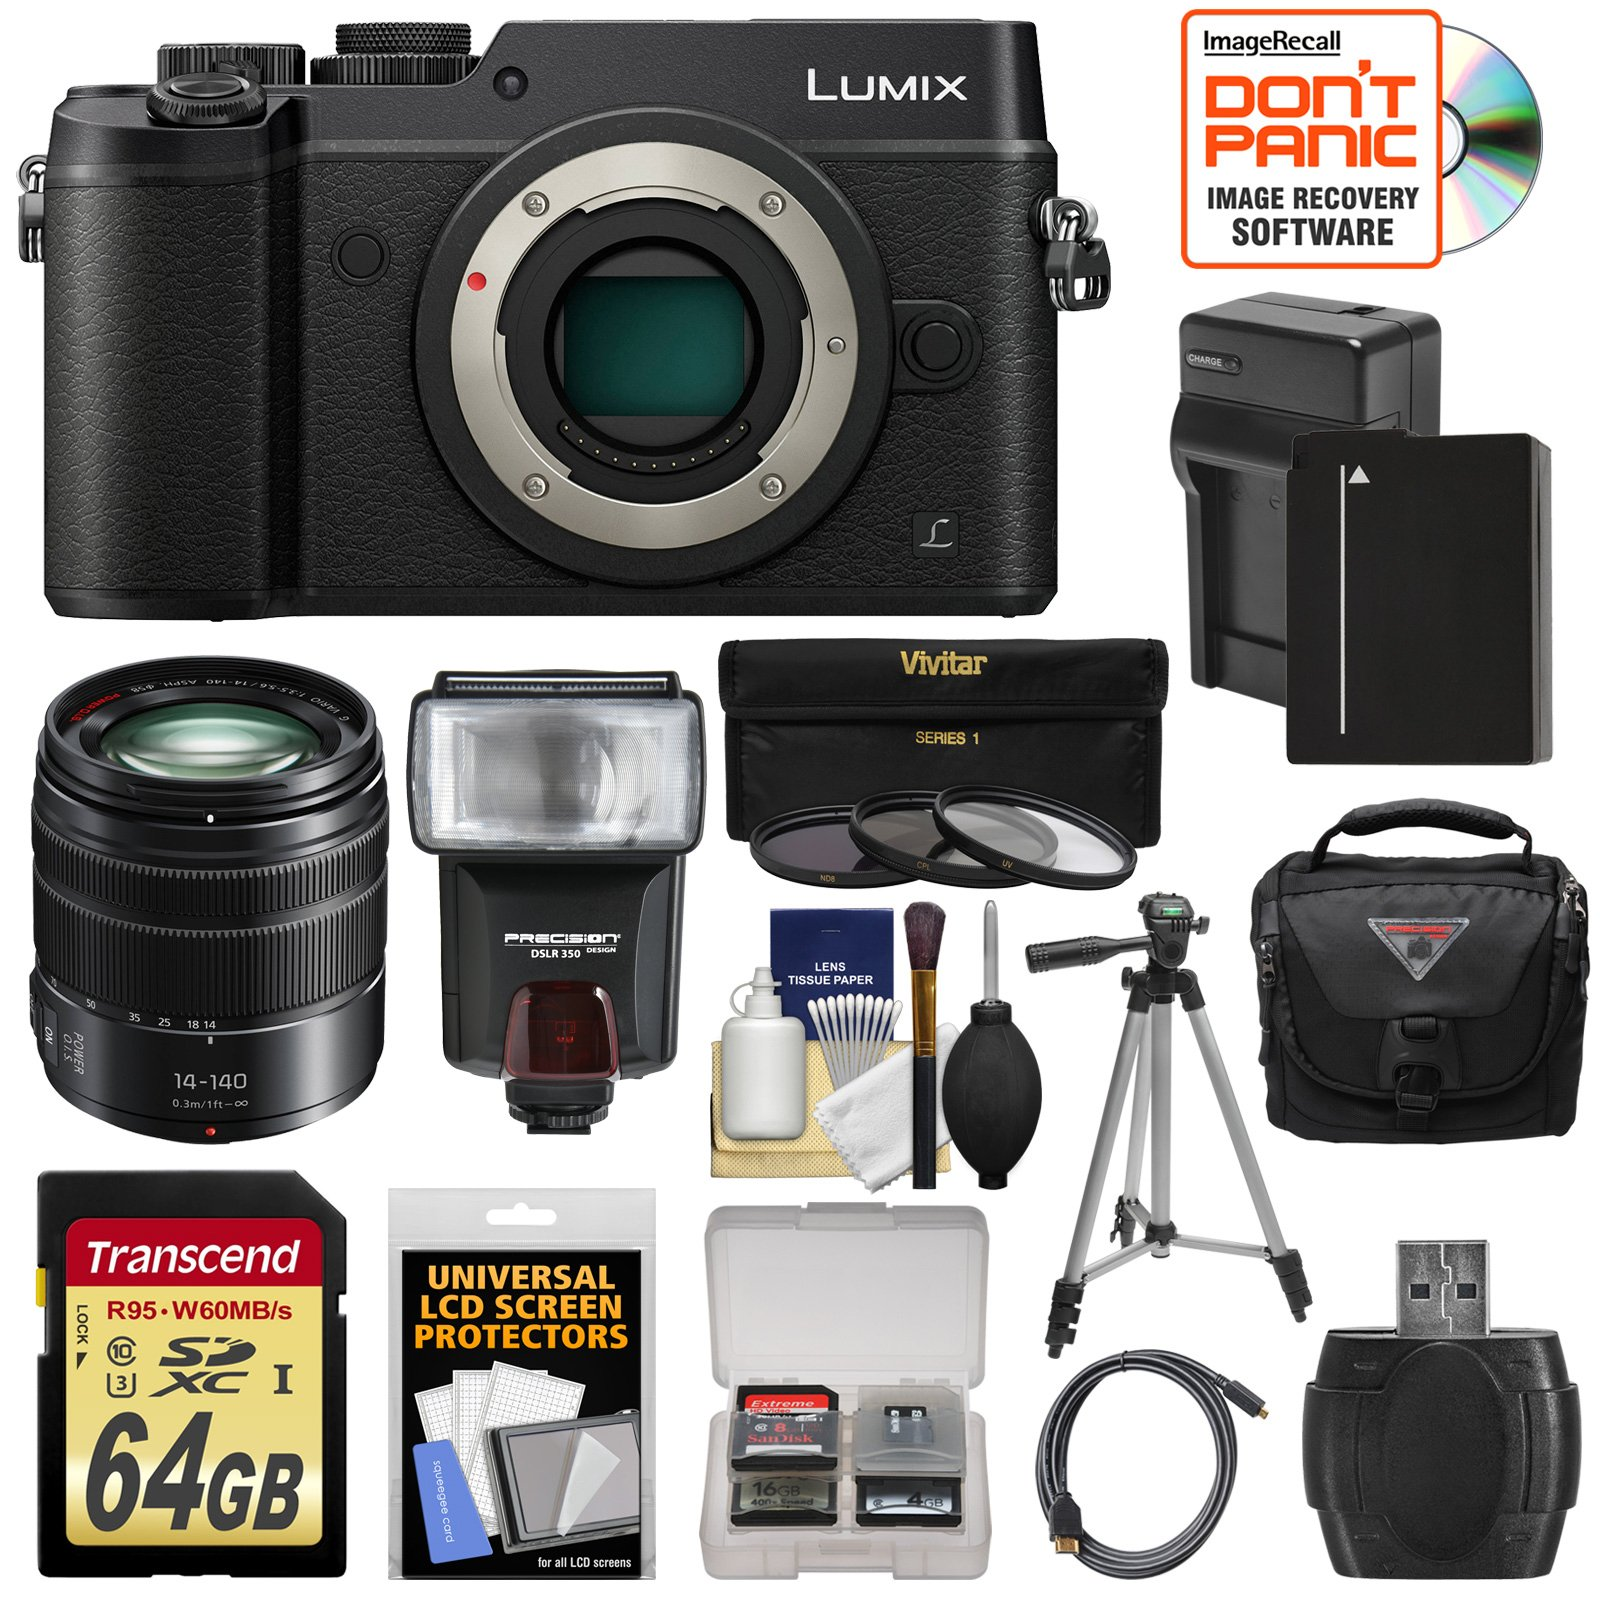 Panasonic Lumix DMC-GX8 4K Wi-Fi Digital Camera Body (Black) with 14-140mm Power OIS Lens + 64GB Card + Battery & Charger + Case + Flash + Tripod Kit